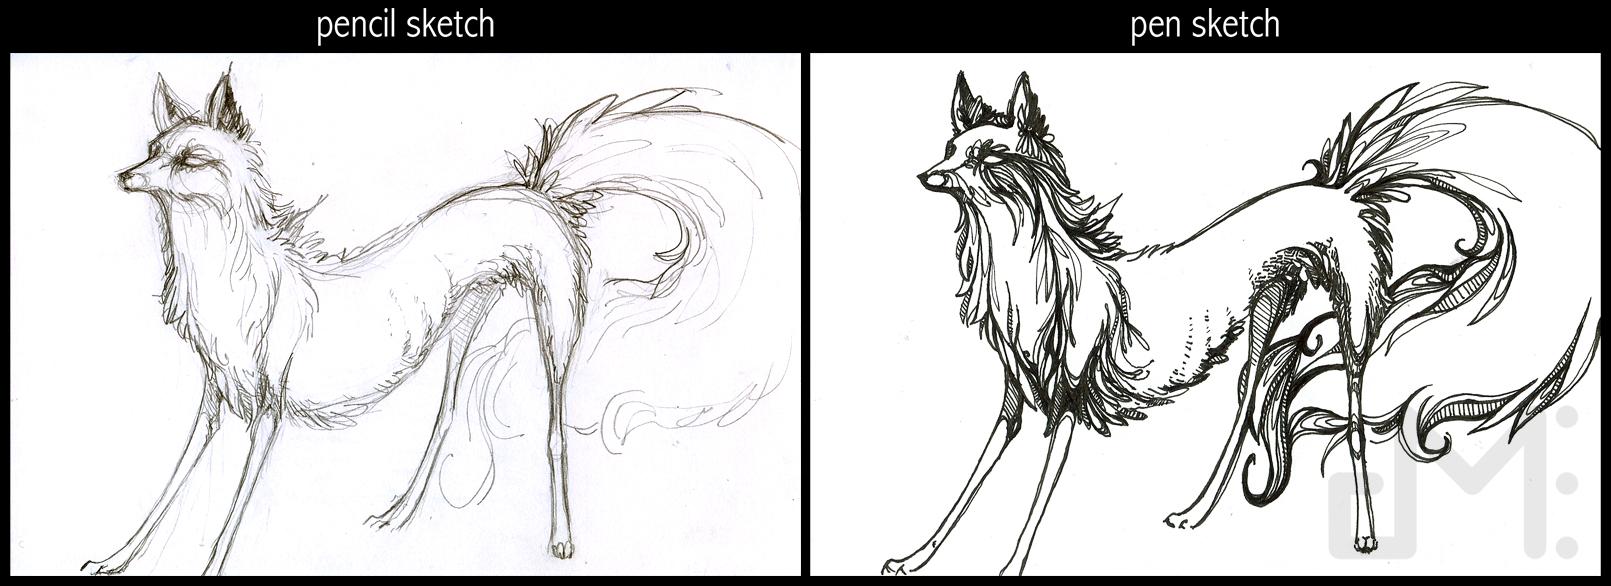 Line Art Vs Sketch : Pencil sketch vs pen drawing by dmaterialize on deviantart